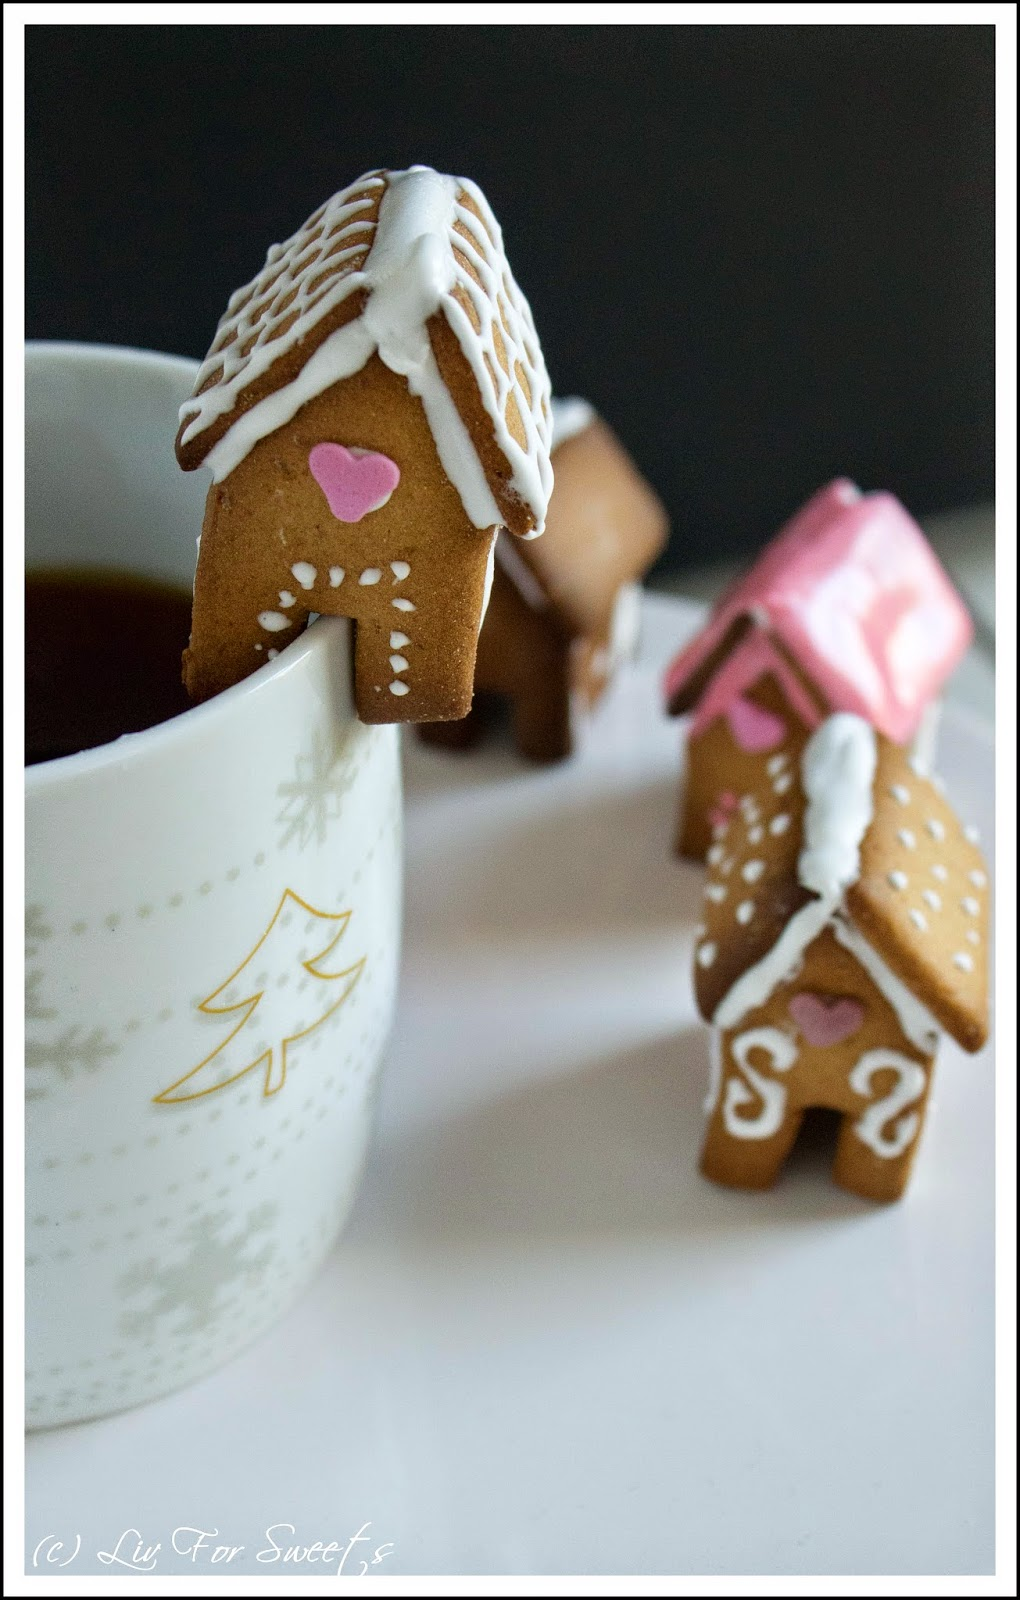 Mini Lebkuchentassenhaus, Teetasse, Lebkuchenhaus, Rezept, Thermomix, Weihnachten, Kaffeetasse